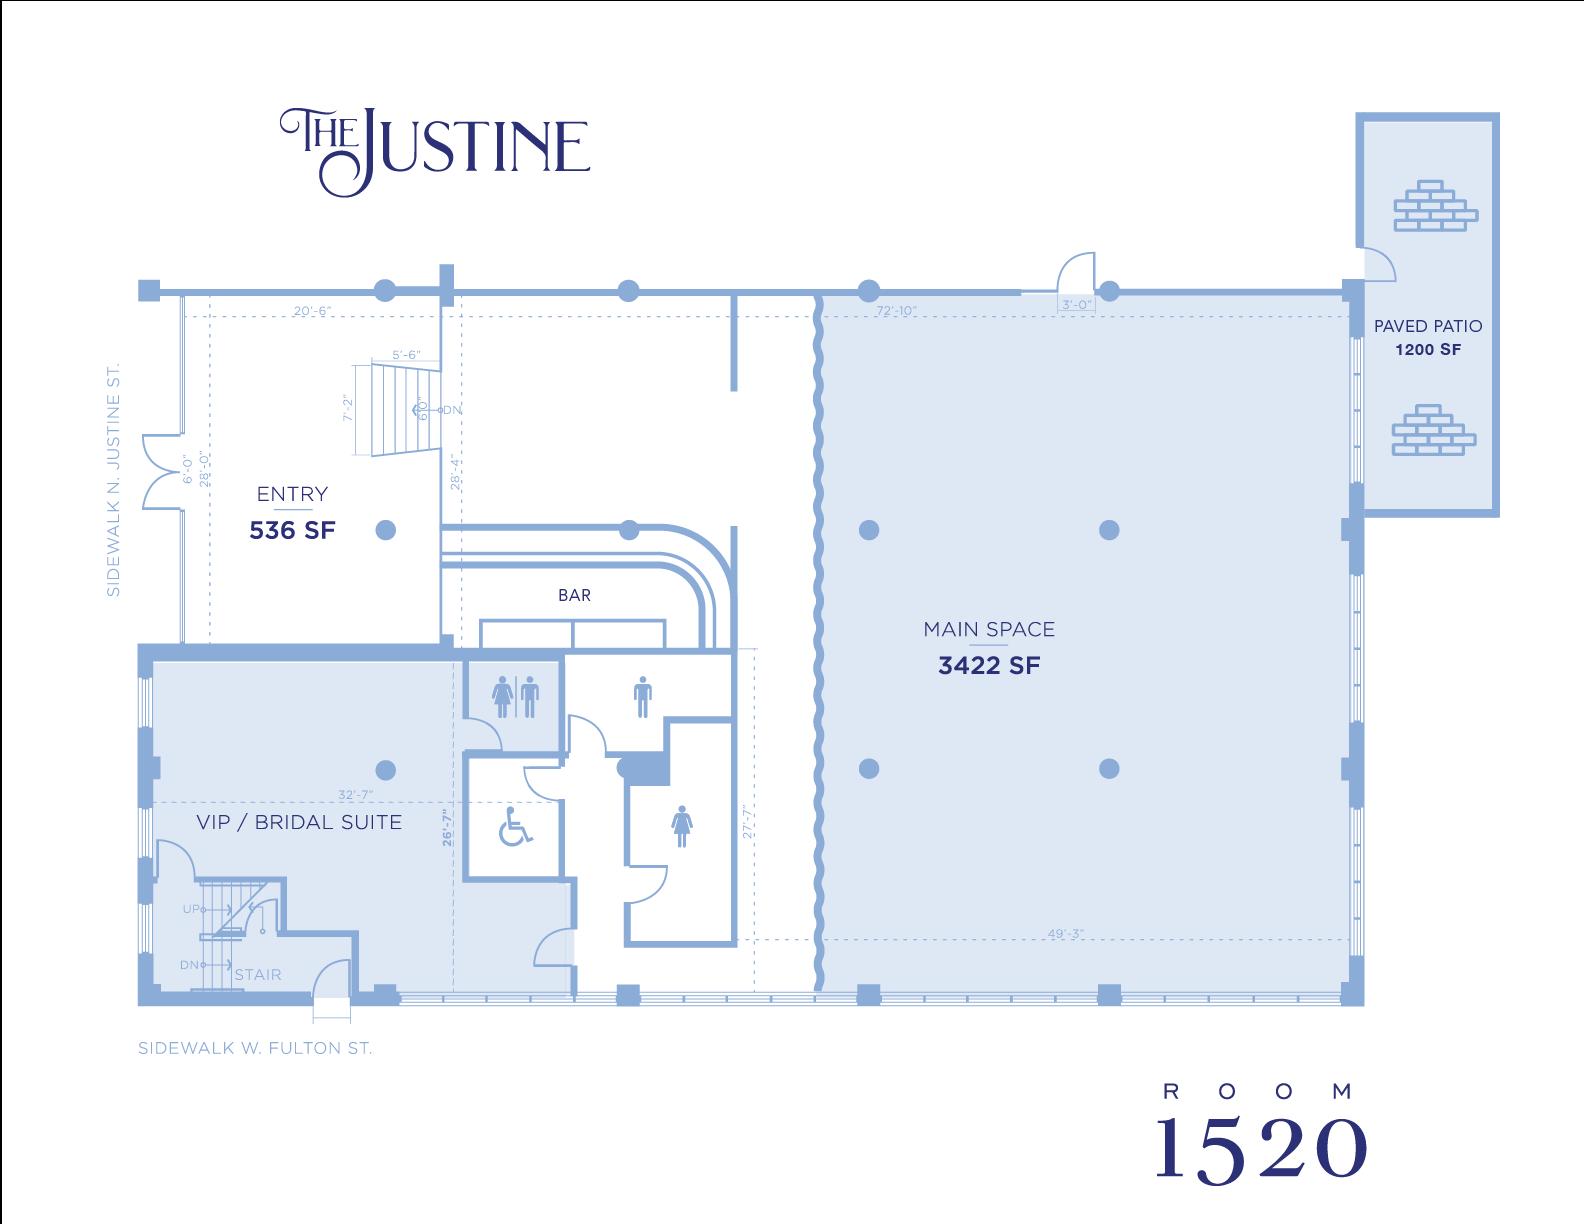 The Justine Floor Plan